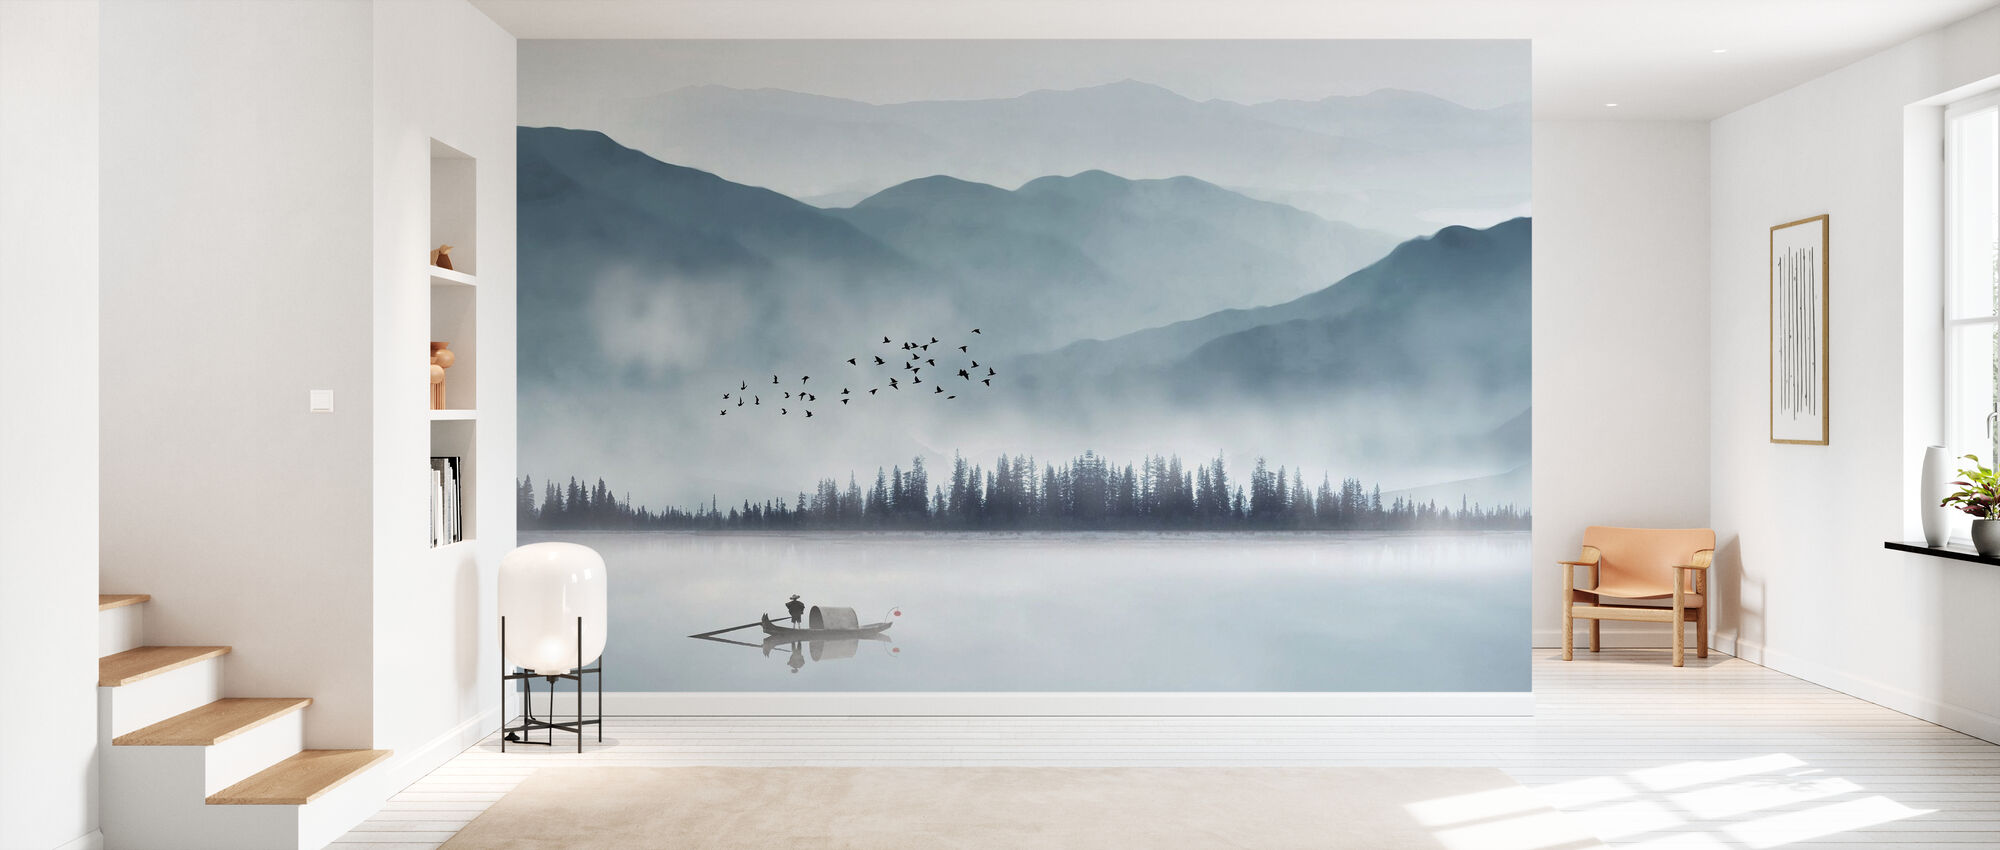 Fisherman - Wallpaper - Hallway